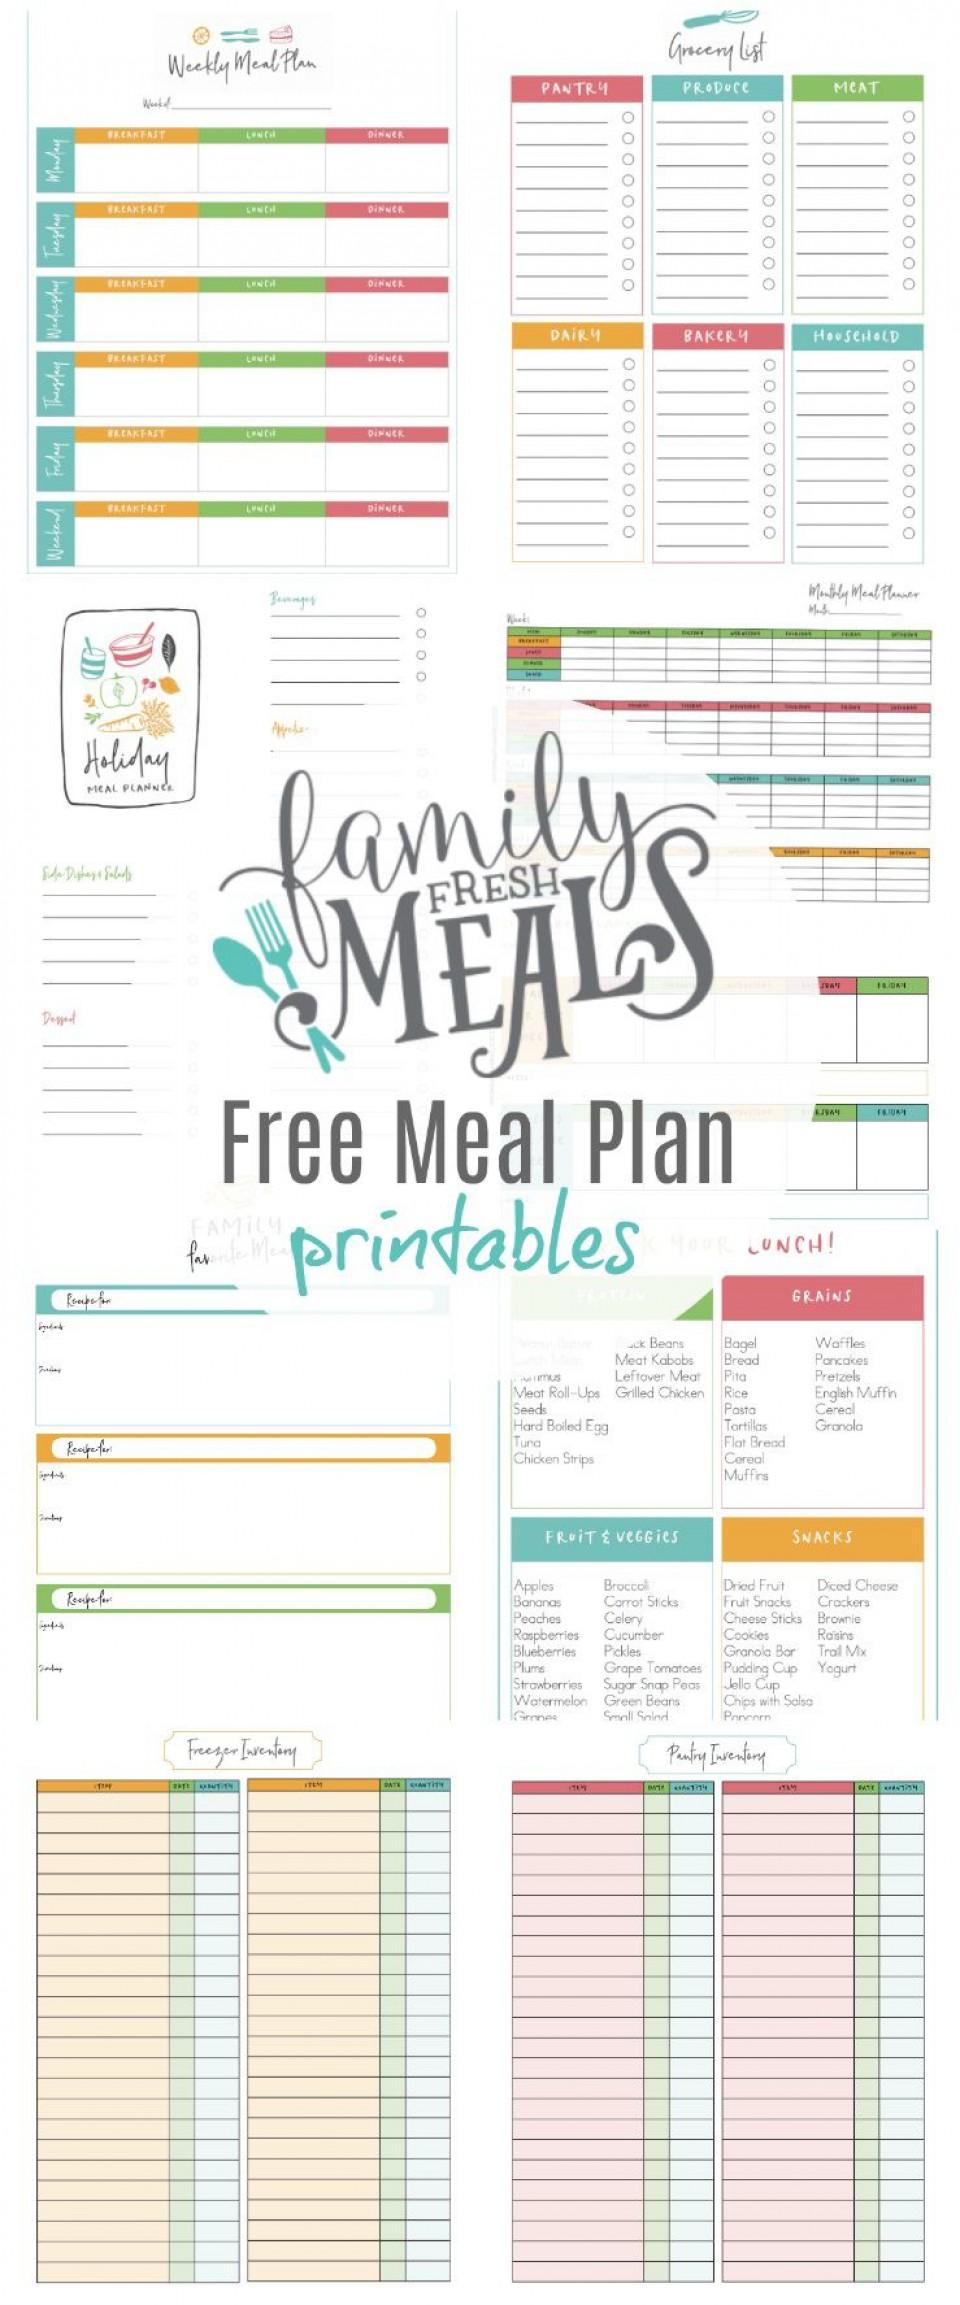 003 Unbelievable Meal Plan Printable Pdf Photo  Worksheet Downloadable Template Sheet960